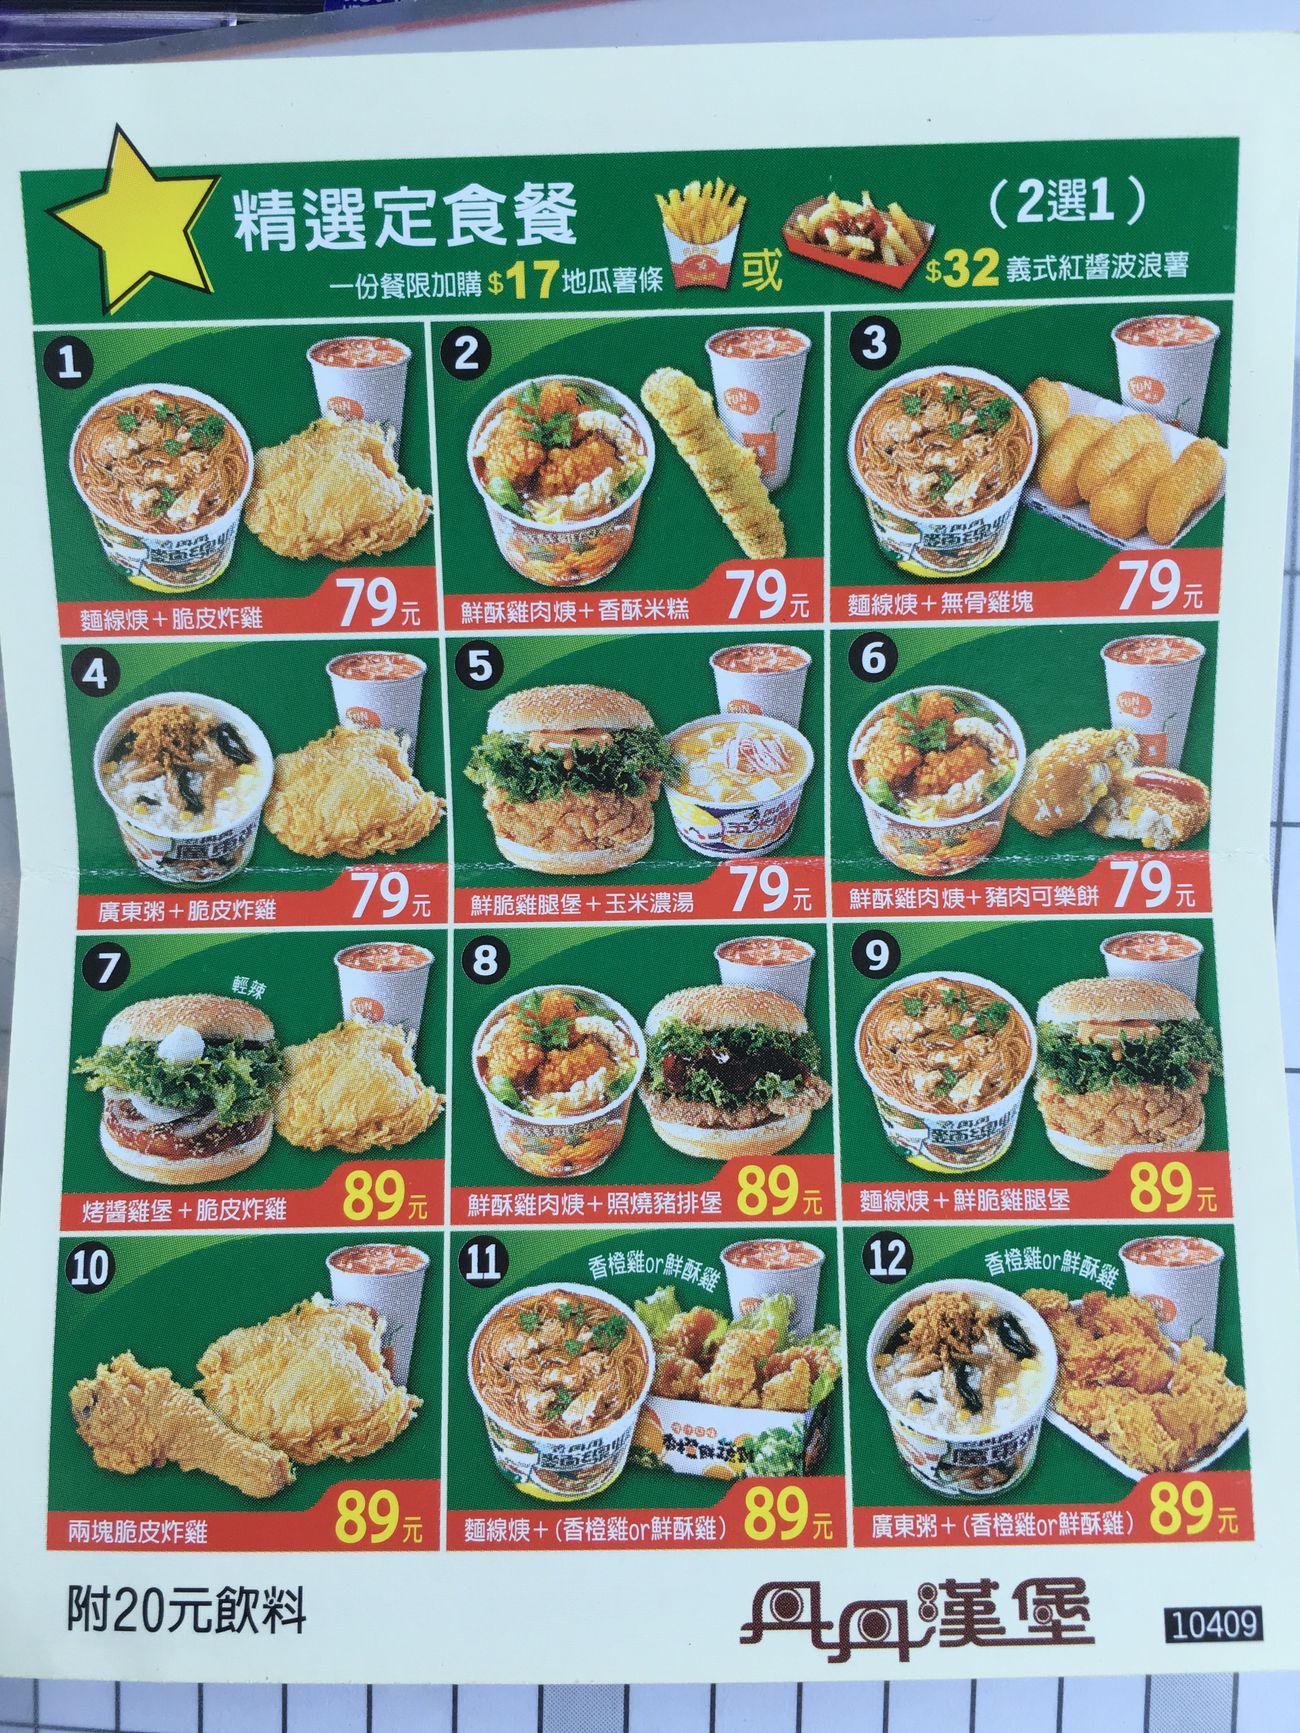 Taiwanese January Kaohsiung 一月 Taiwan 高雄 臺灣 大魯閣草衙道 工地 草衙 午餐 丹丹